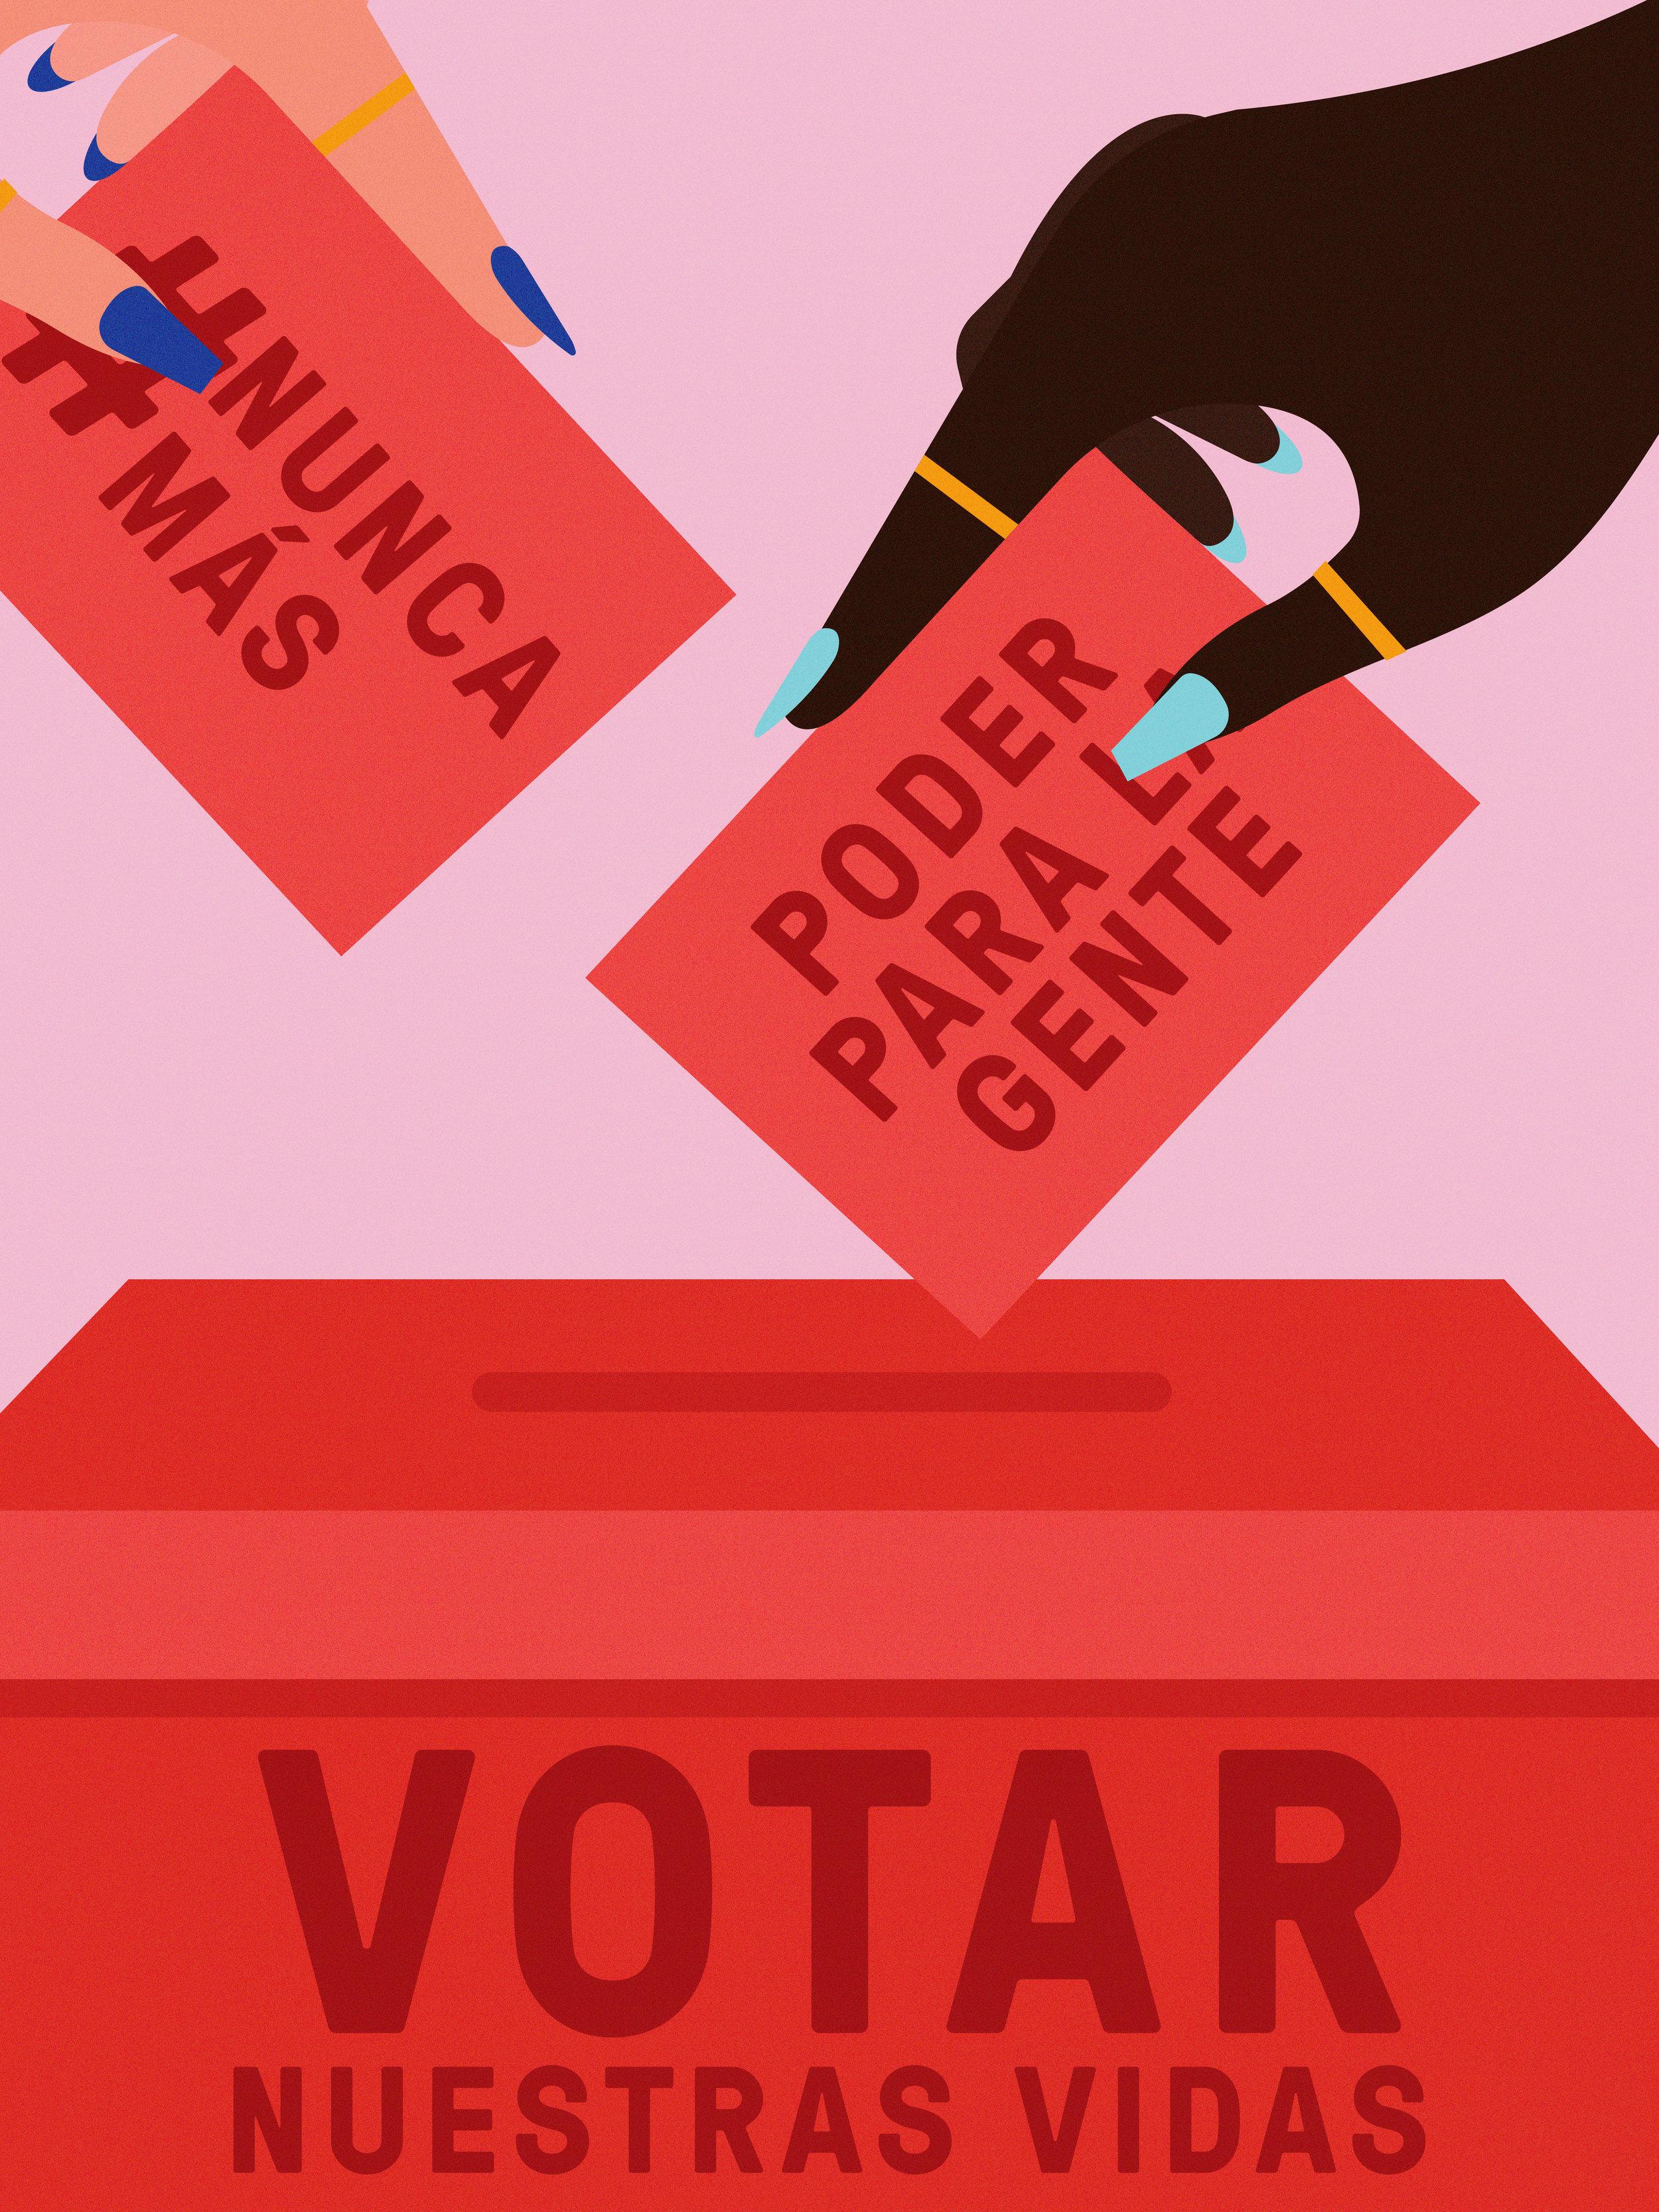 Laci_Jordan_Poster_Spanish_Web.jpg